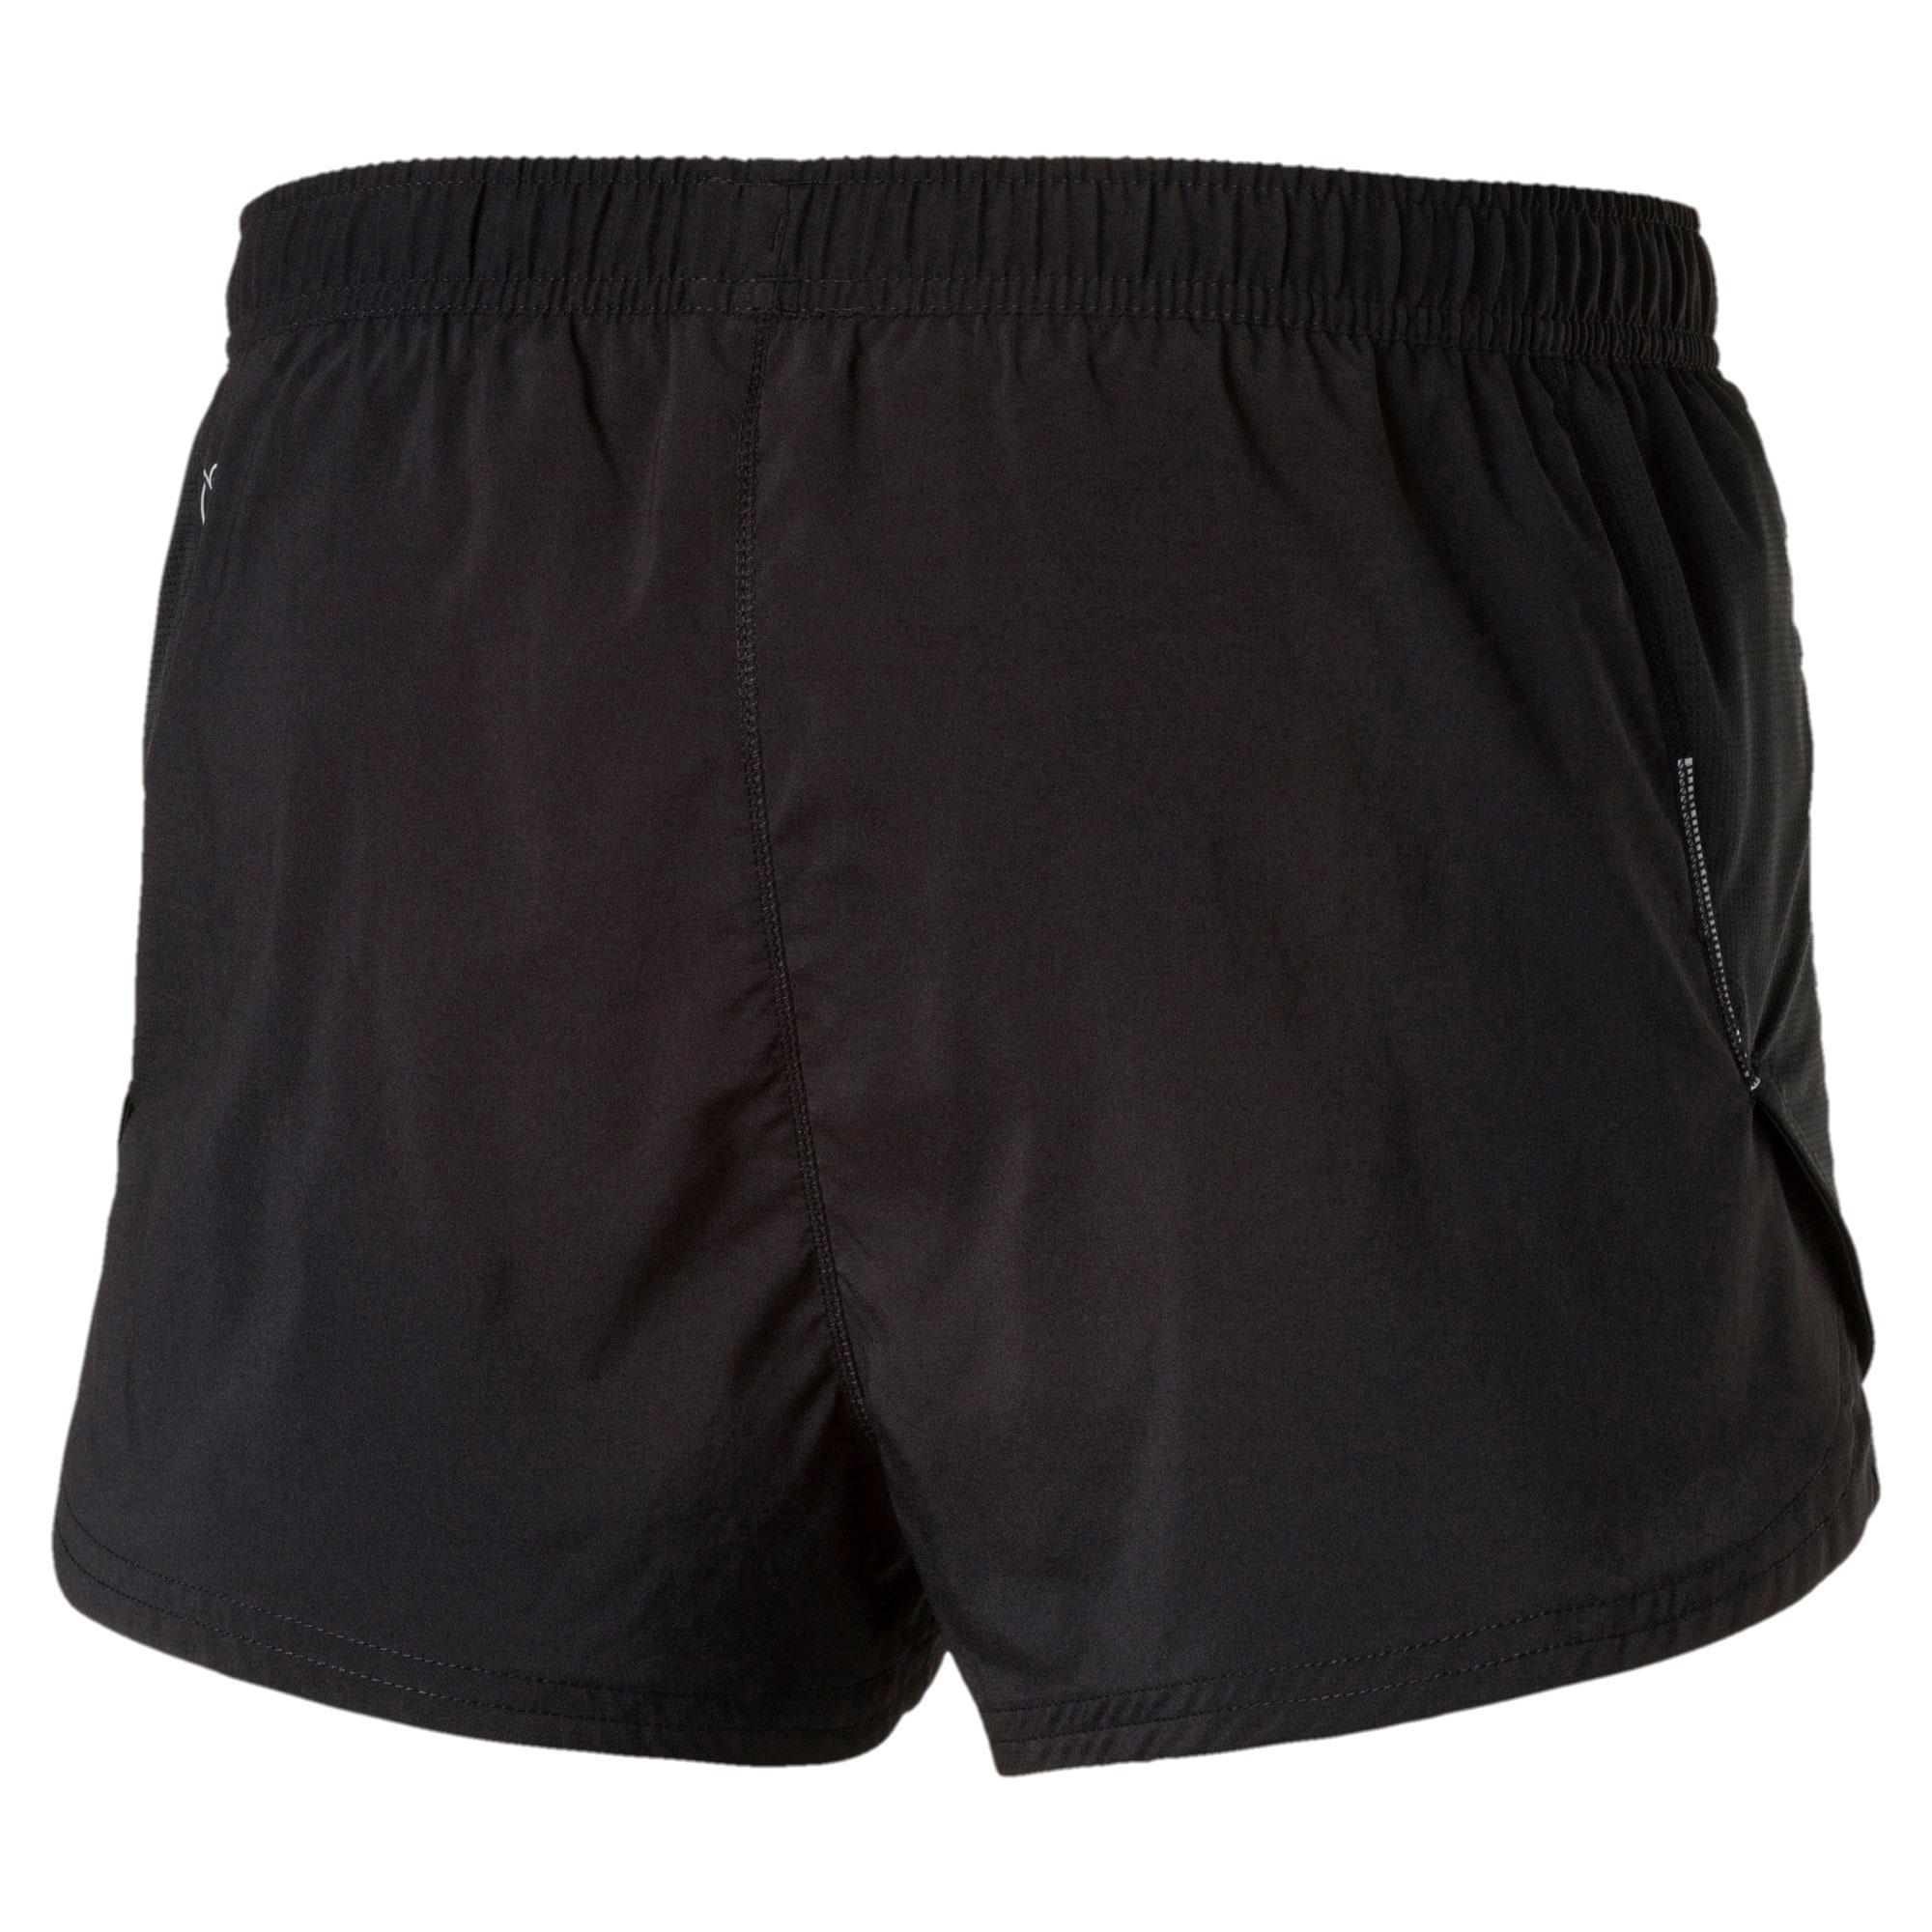 Thumbnail 5 of Running Men's Split Shorts, Puma Black, medium-IND